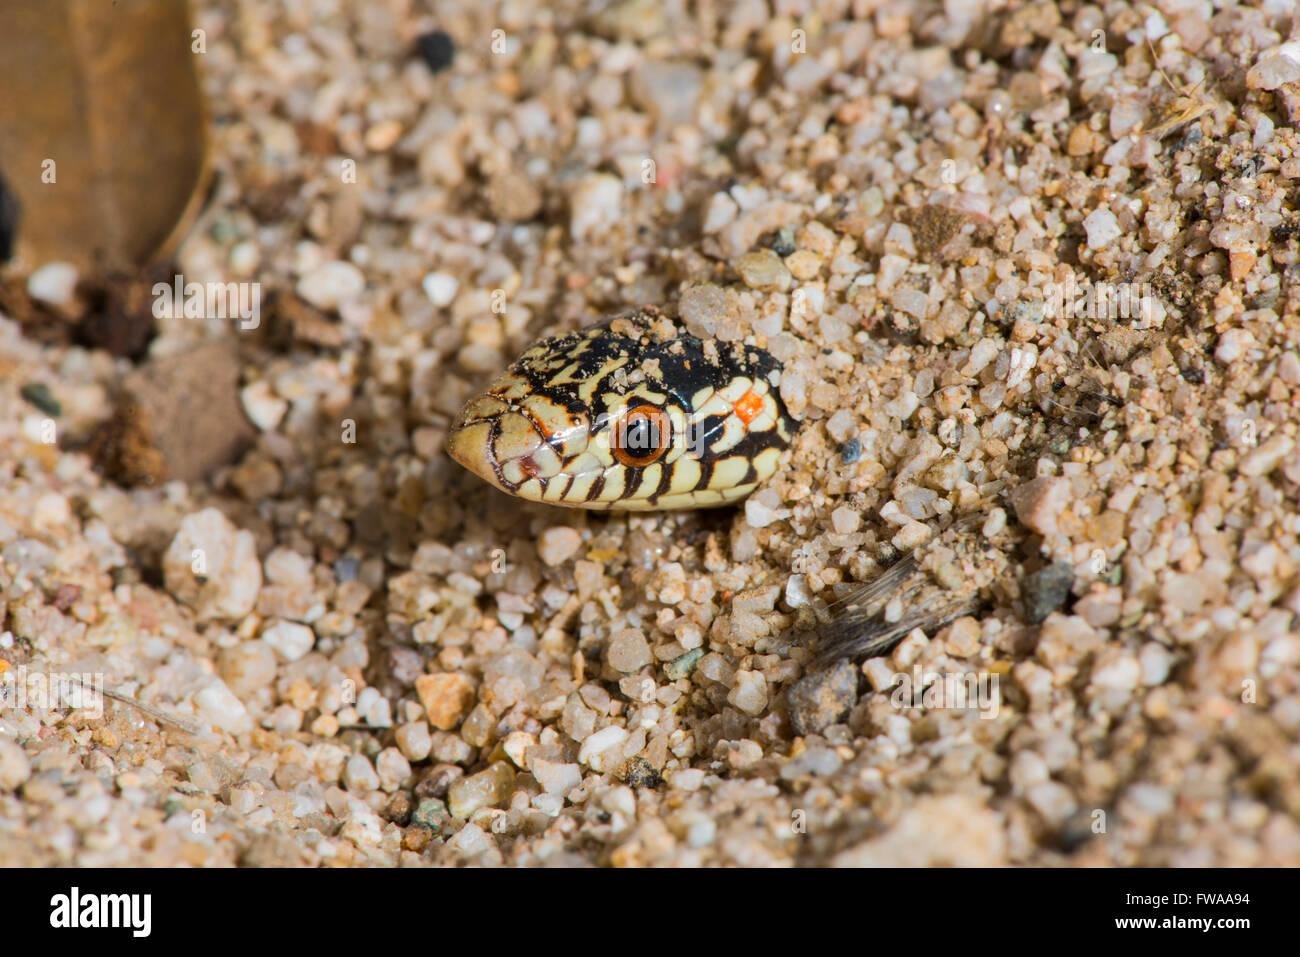 Langnasen-Snake Rhinocheilus Lecontei Tucson, Pima County, Arizona, USA 12 August Erwachsenen Colubridae Stockbild